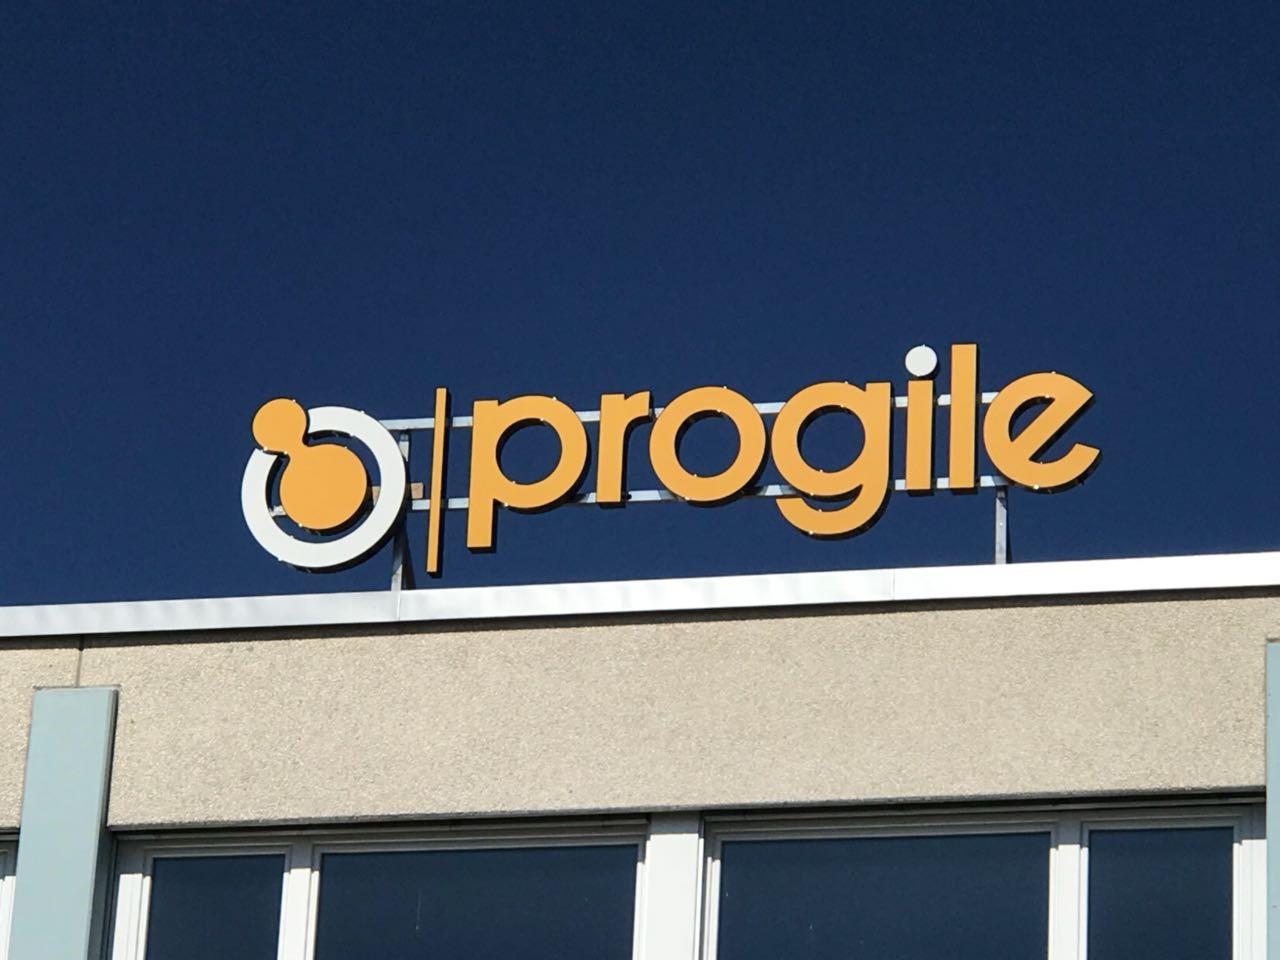 prgile1